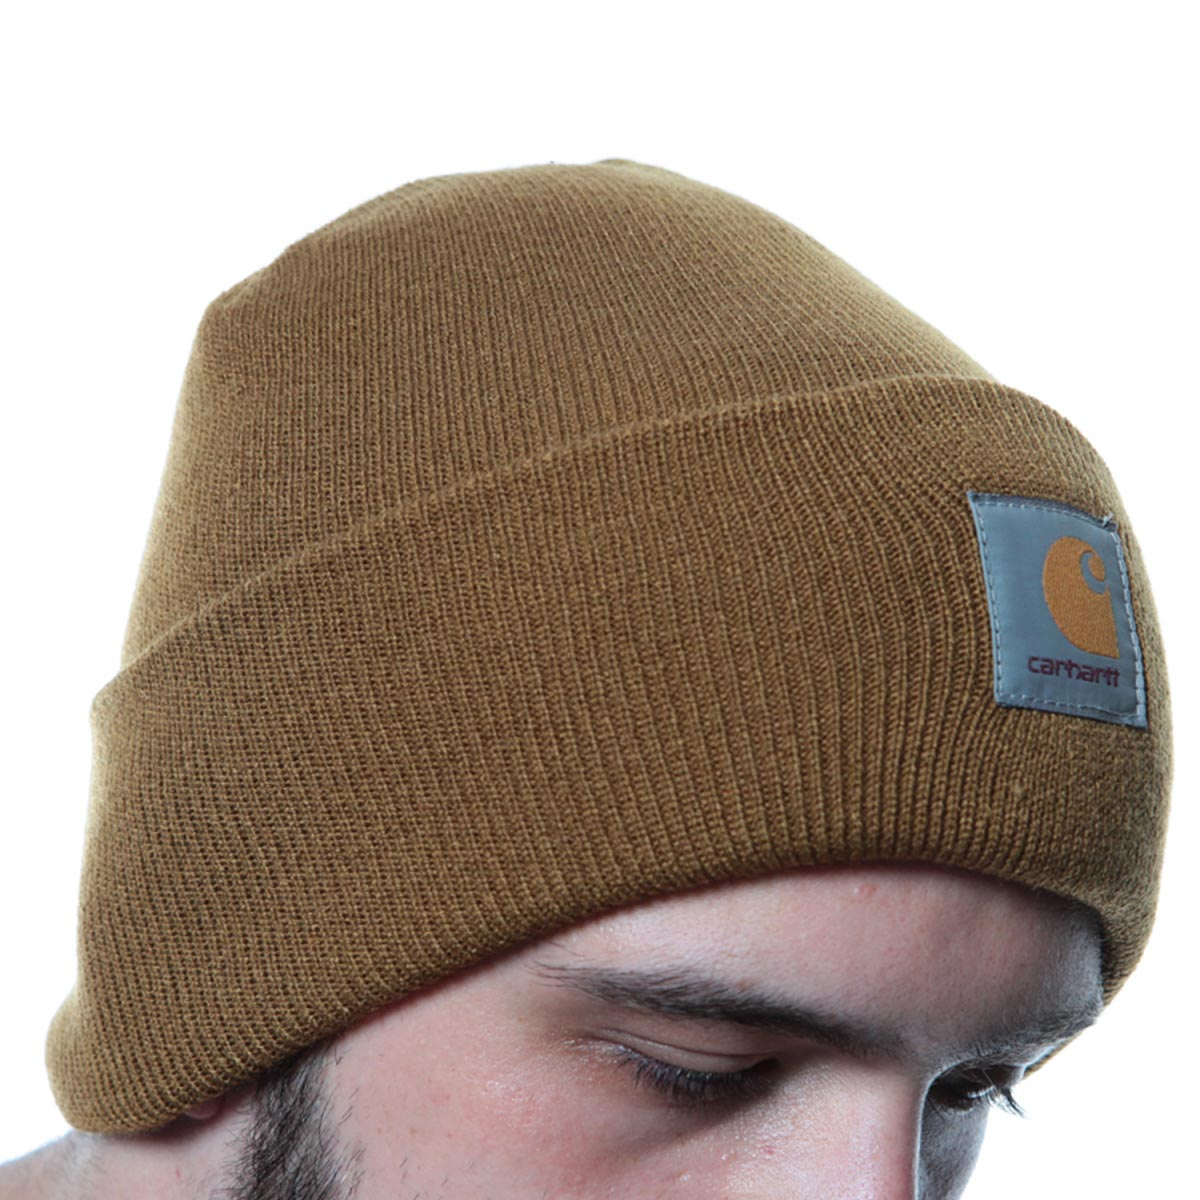 4bb8fd67d2b Vendita online Acrylic Watch Hat - Hamilton Brown - Carhartt ...